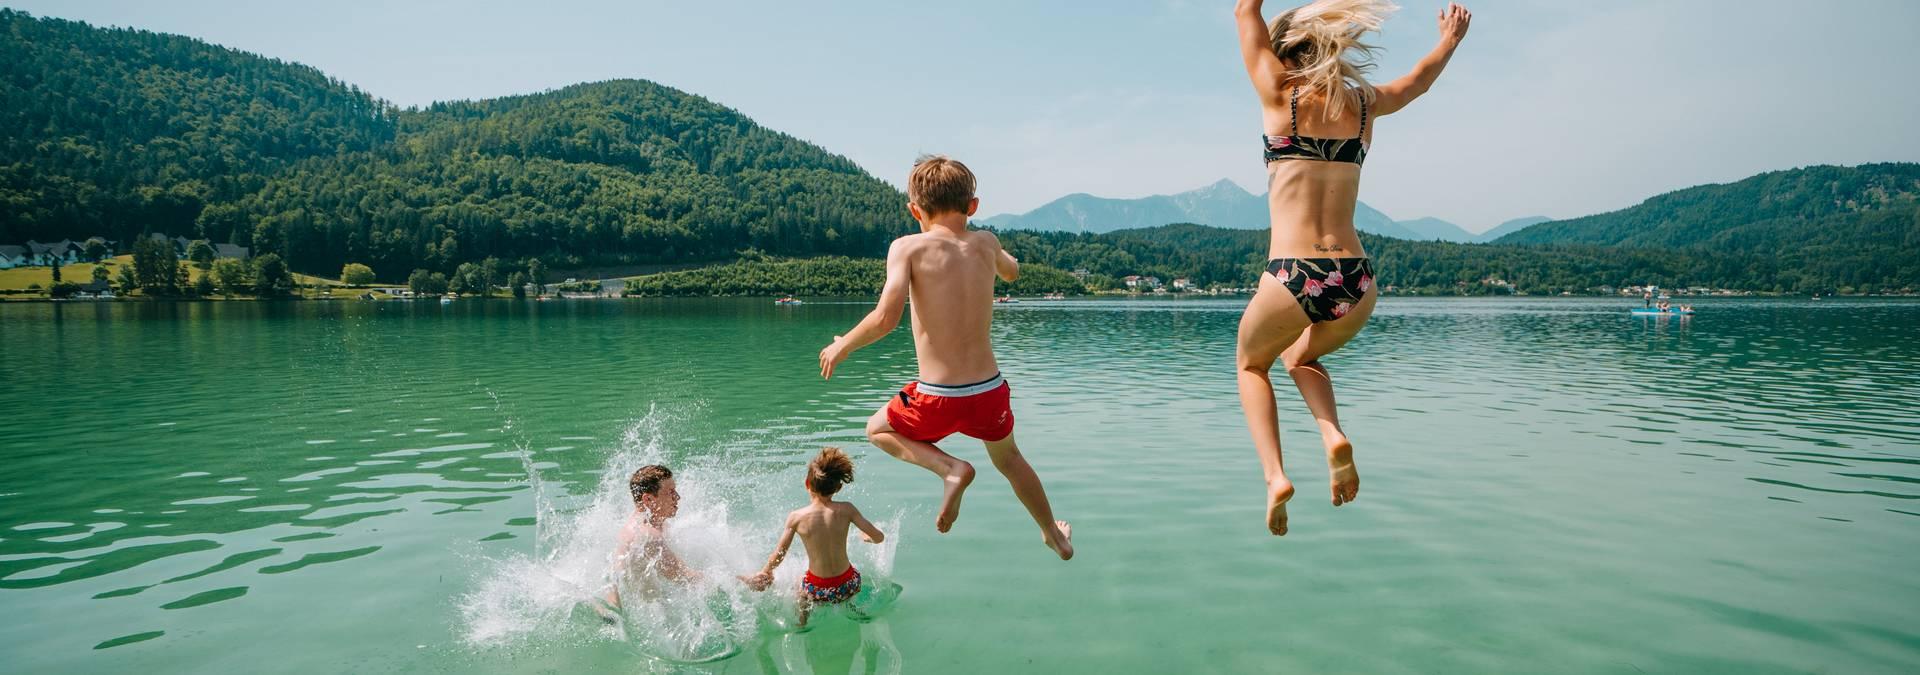 Klopeiner See - Südkärnten - Baden Familie Sommer